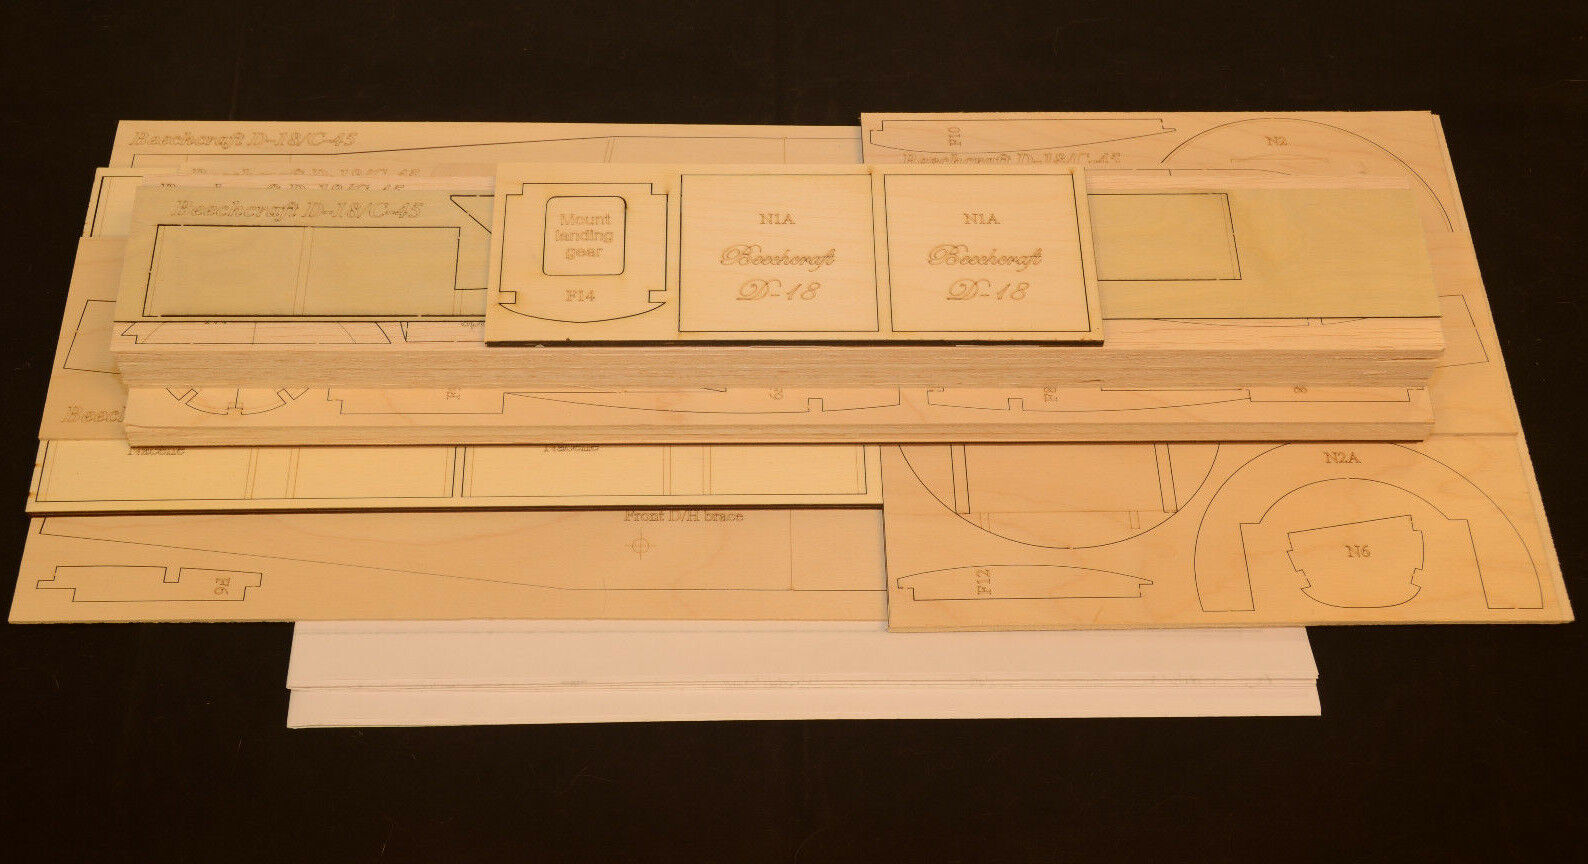 Grande 1/7 escala modelo Beechcraft 18 Kit De Corte Láser Corto & planes 80 in (approx. 203.20 cm) envergadura